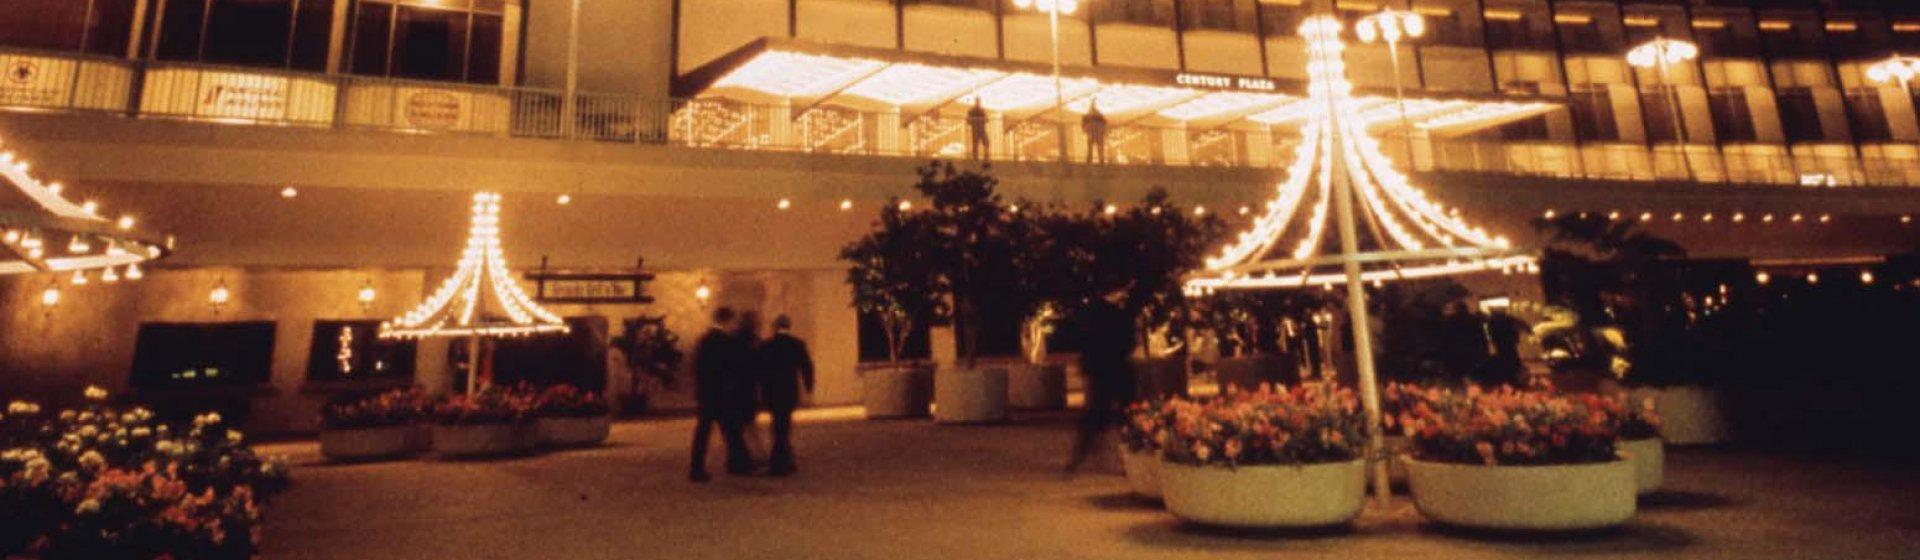 The Fairmont Century Plaza exterior at night.